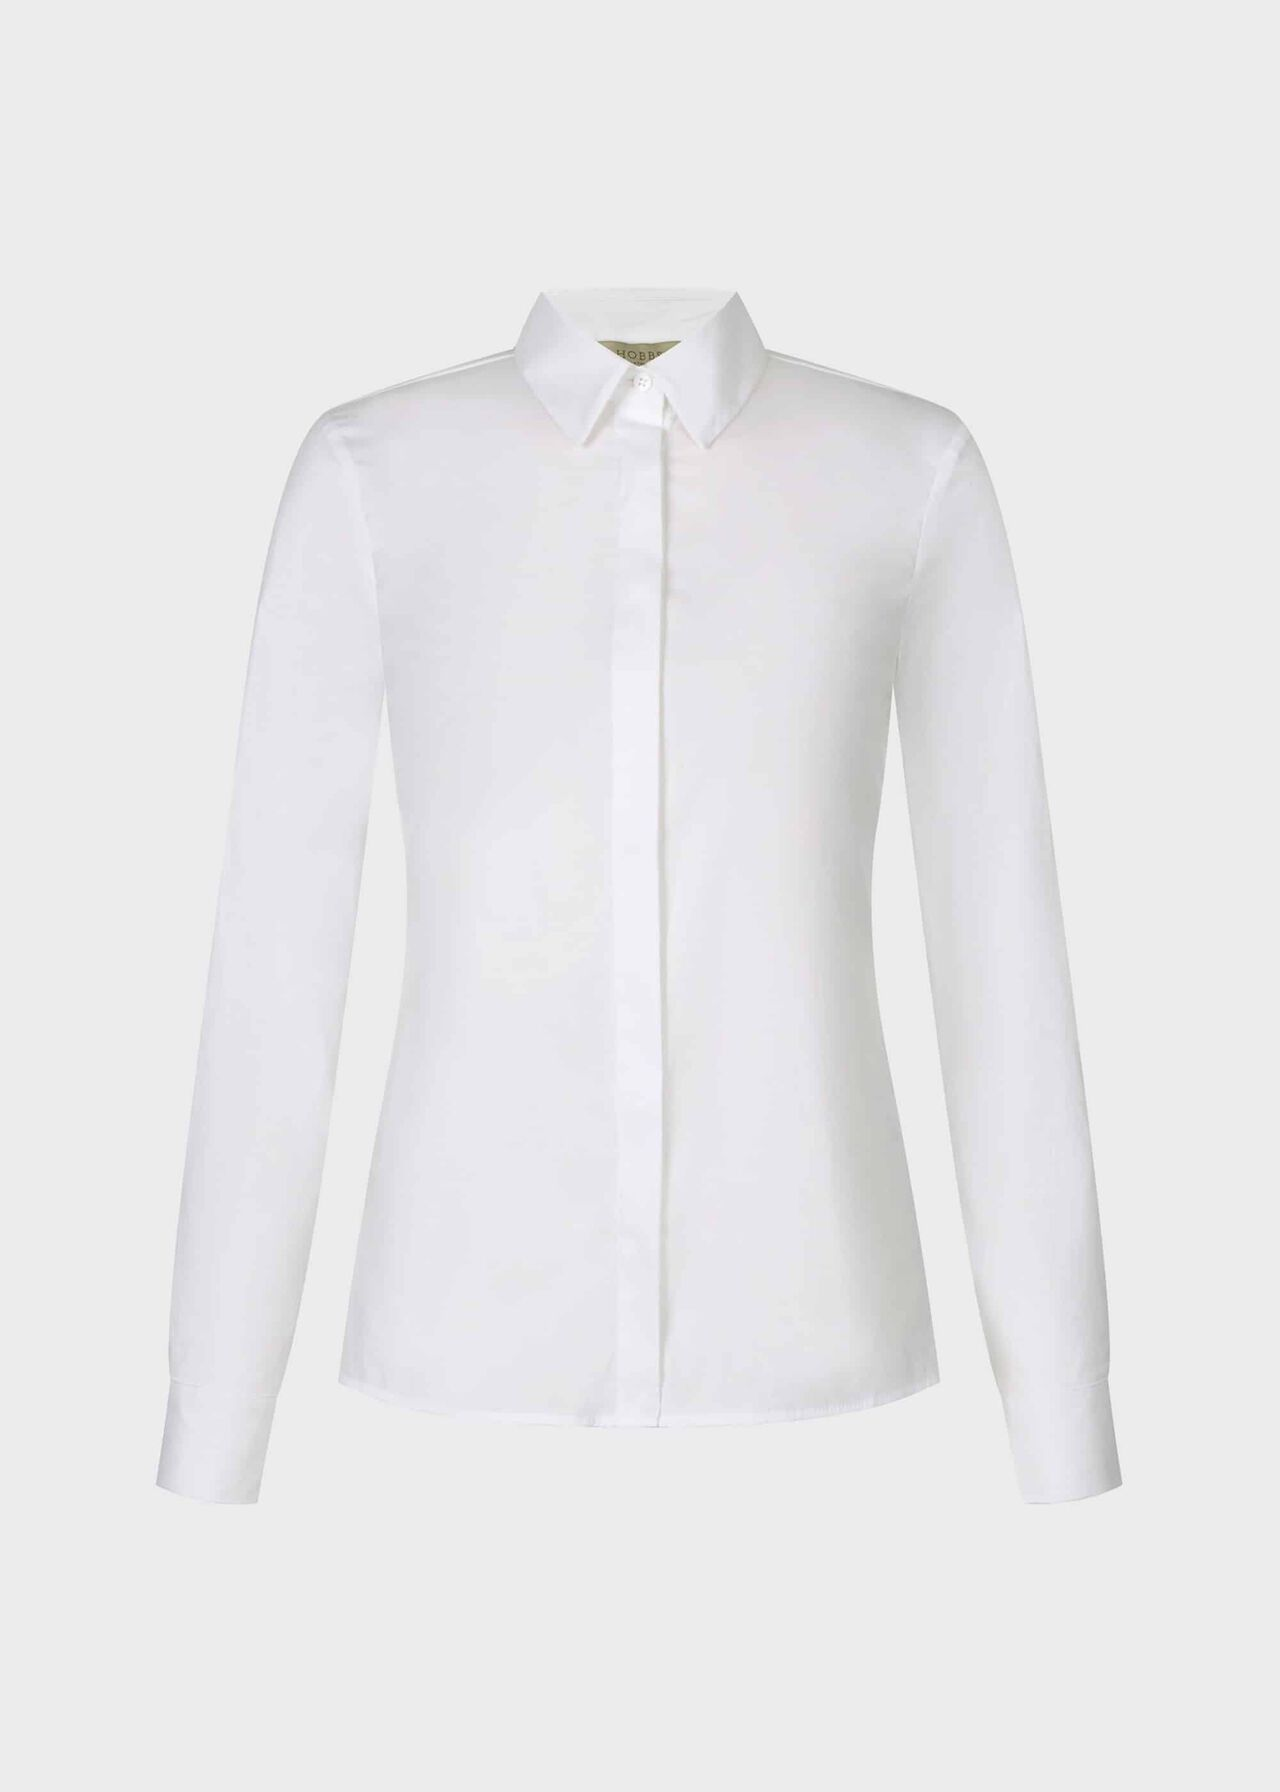 Petite Vic Shirt White